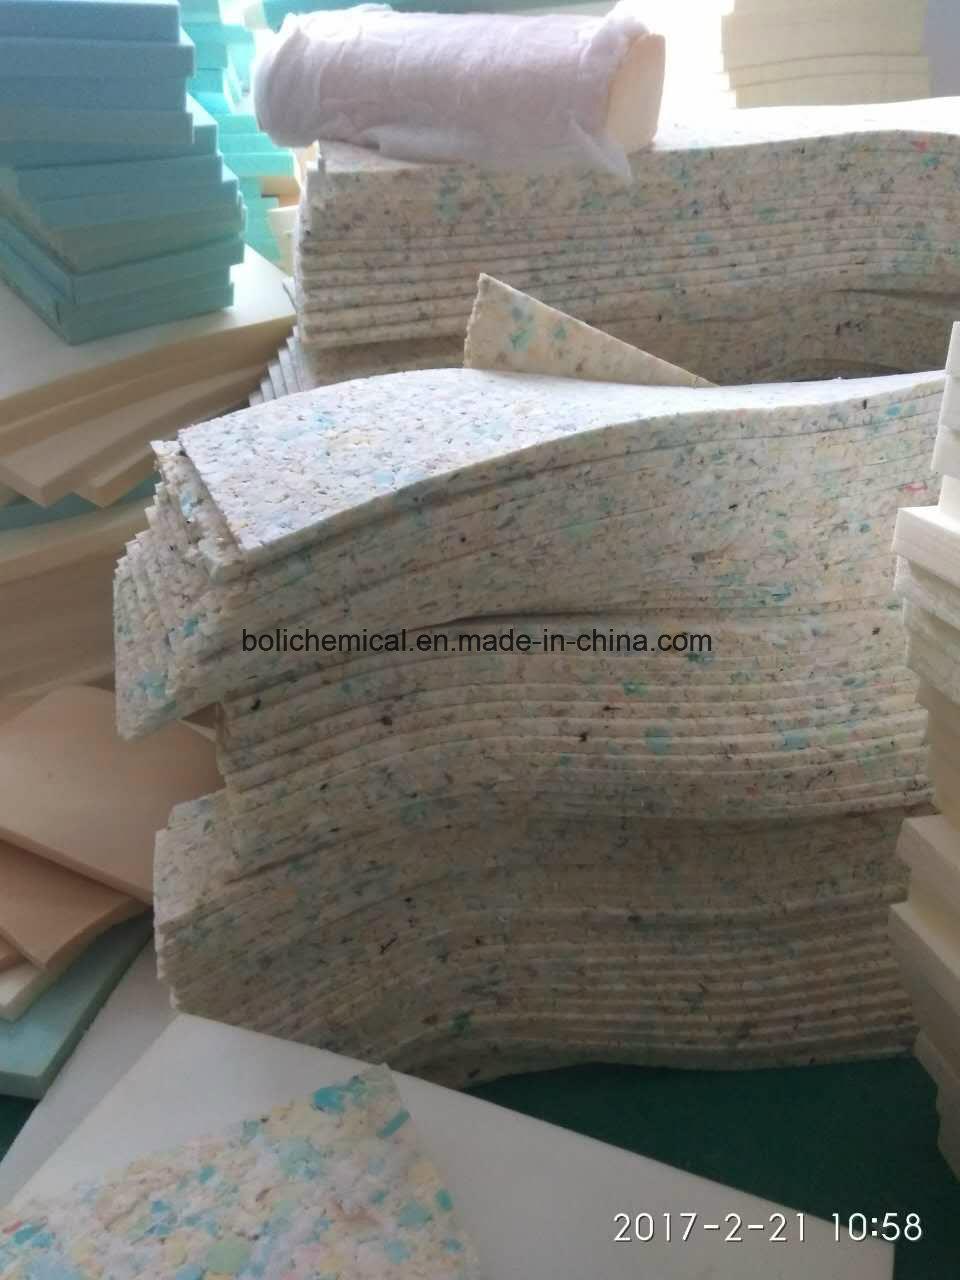 Professional Manufacturer PU Bonding Adhesion Glue for Re-Bond Foam